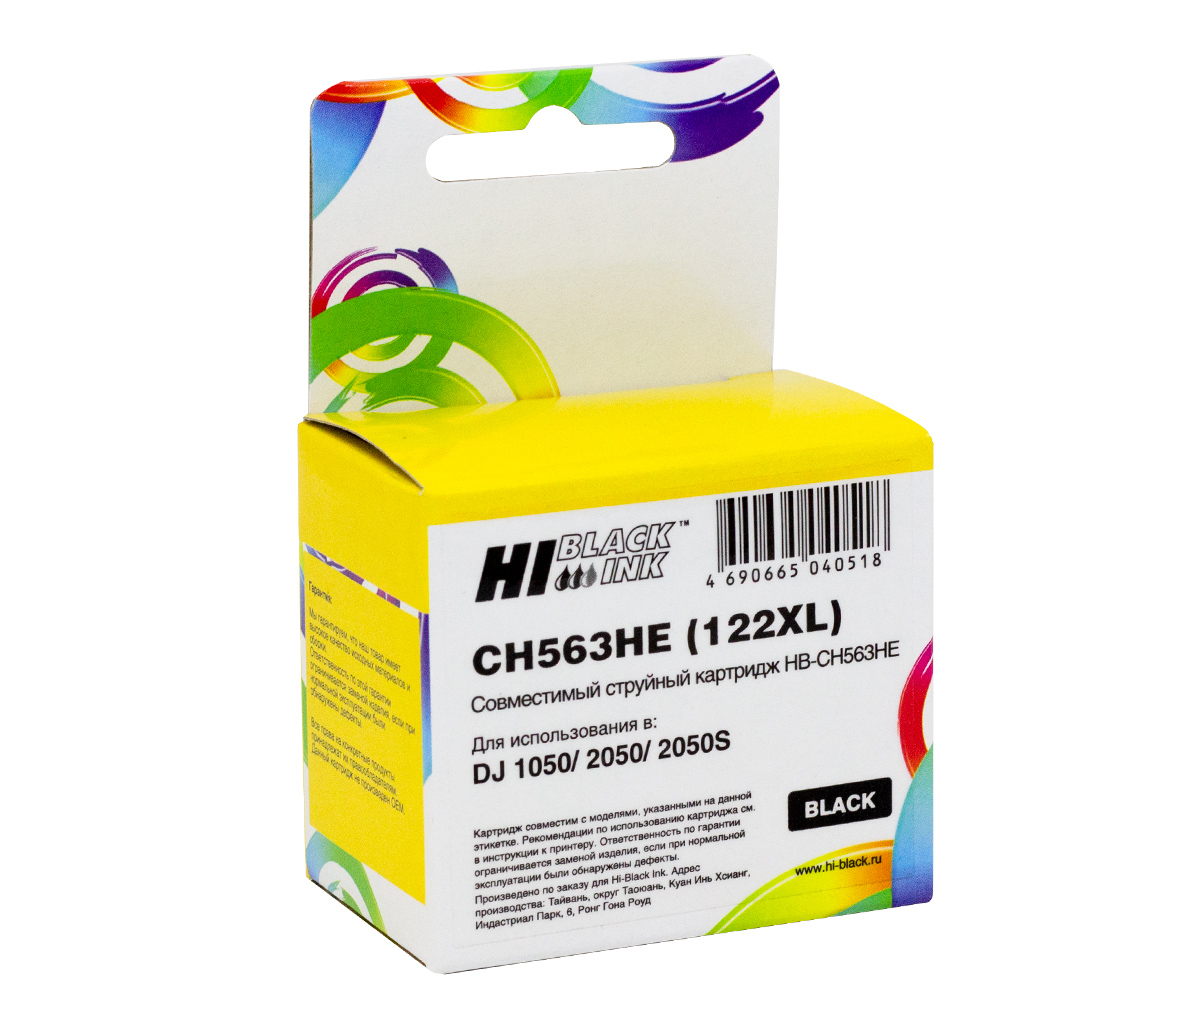 Картридж Hi-Black (CH563HE) для HP DJ 1050/2050/2050S, №122XL, Bk